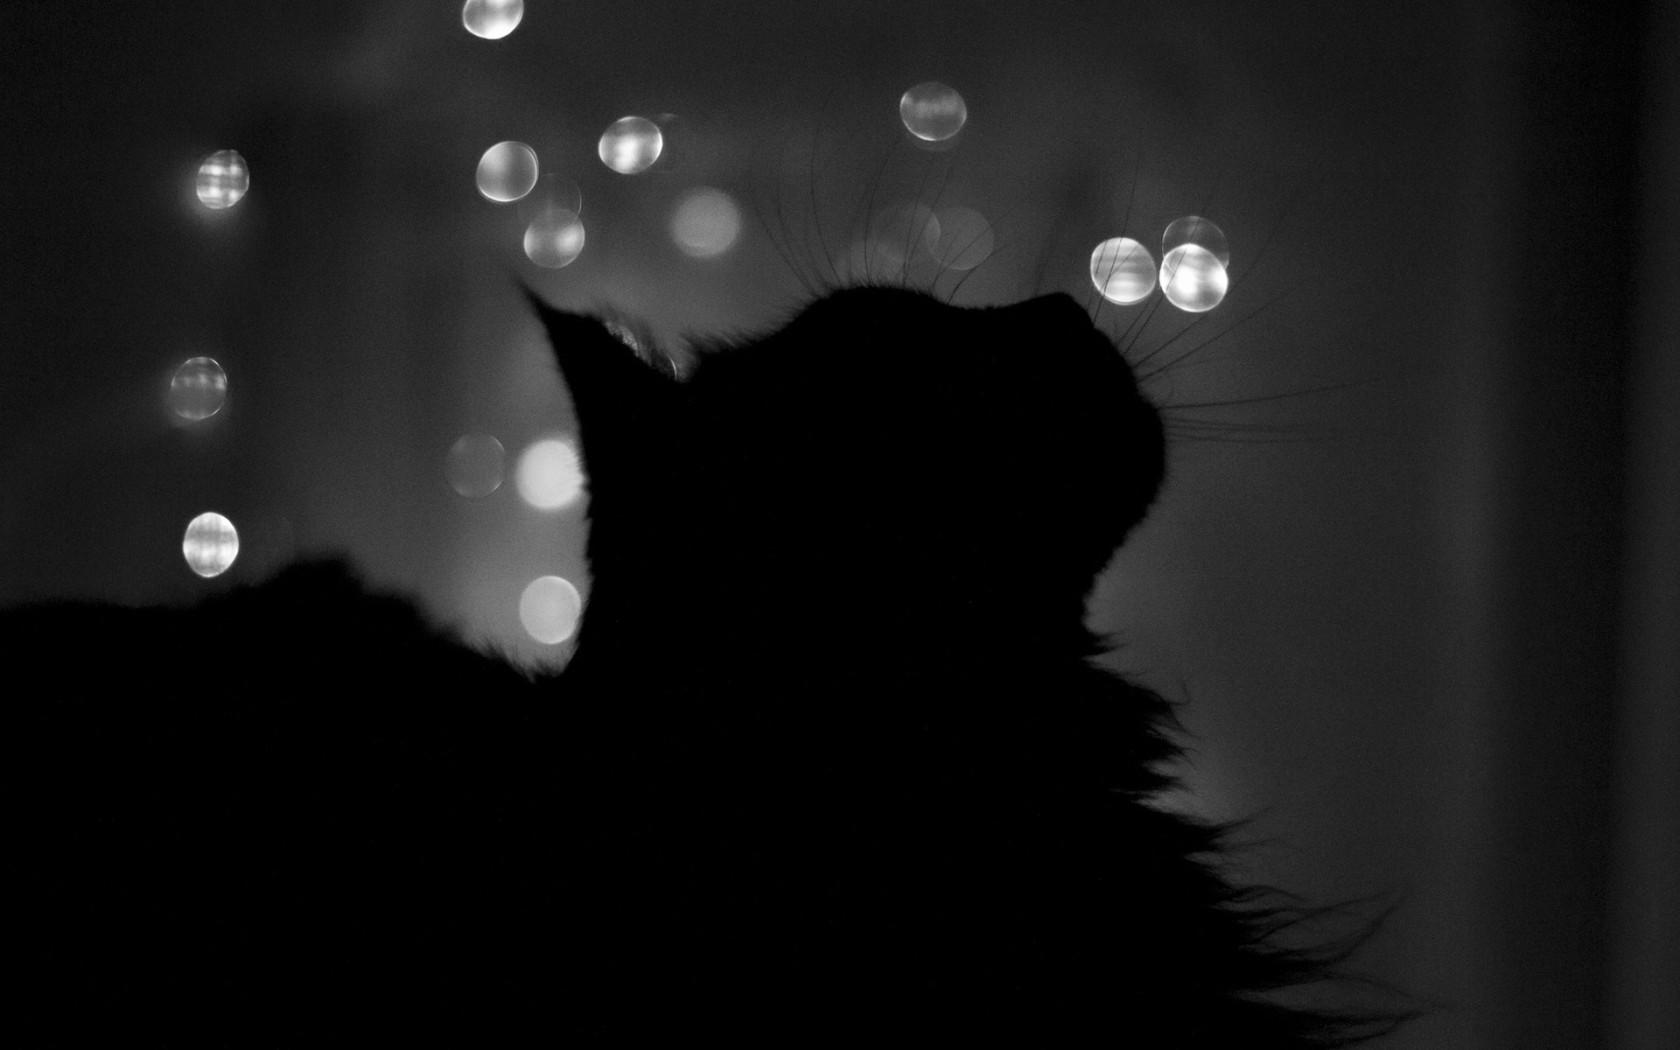 cat shade cats wallpapers desktop dark background hd animals stars